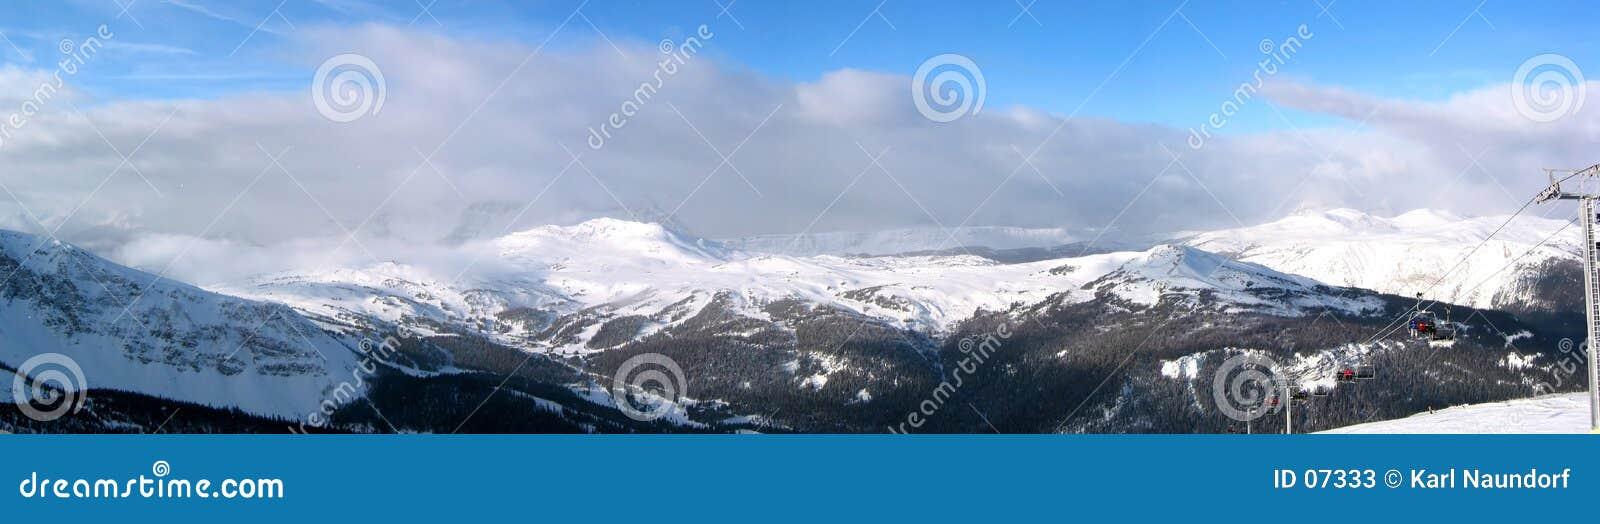 Brygga bergstorm